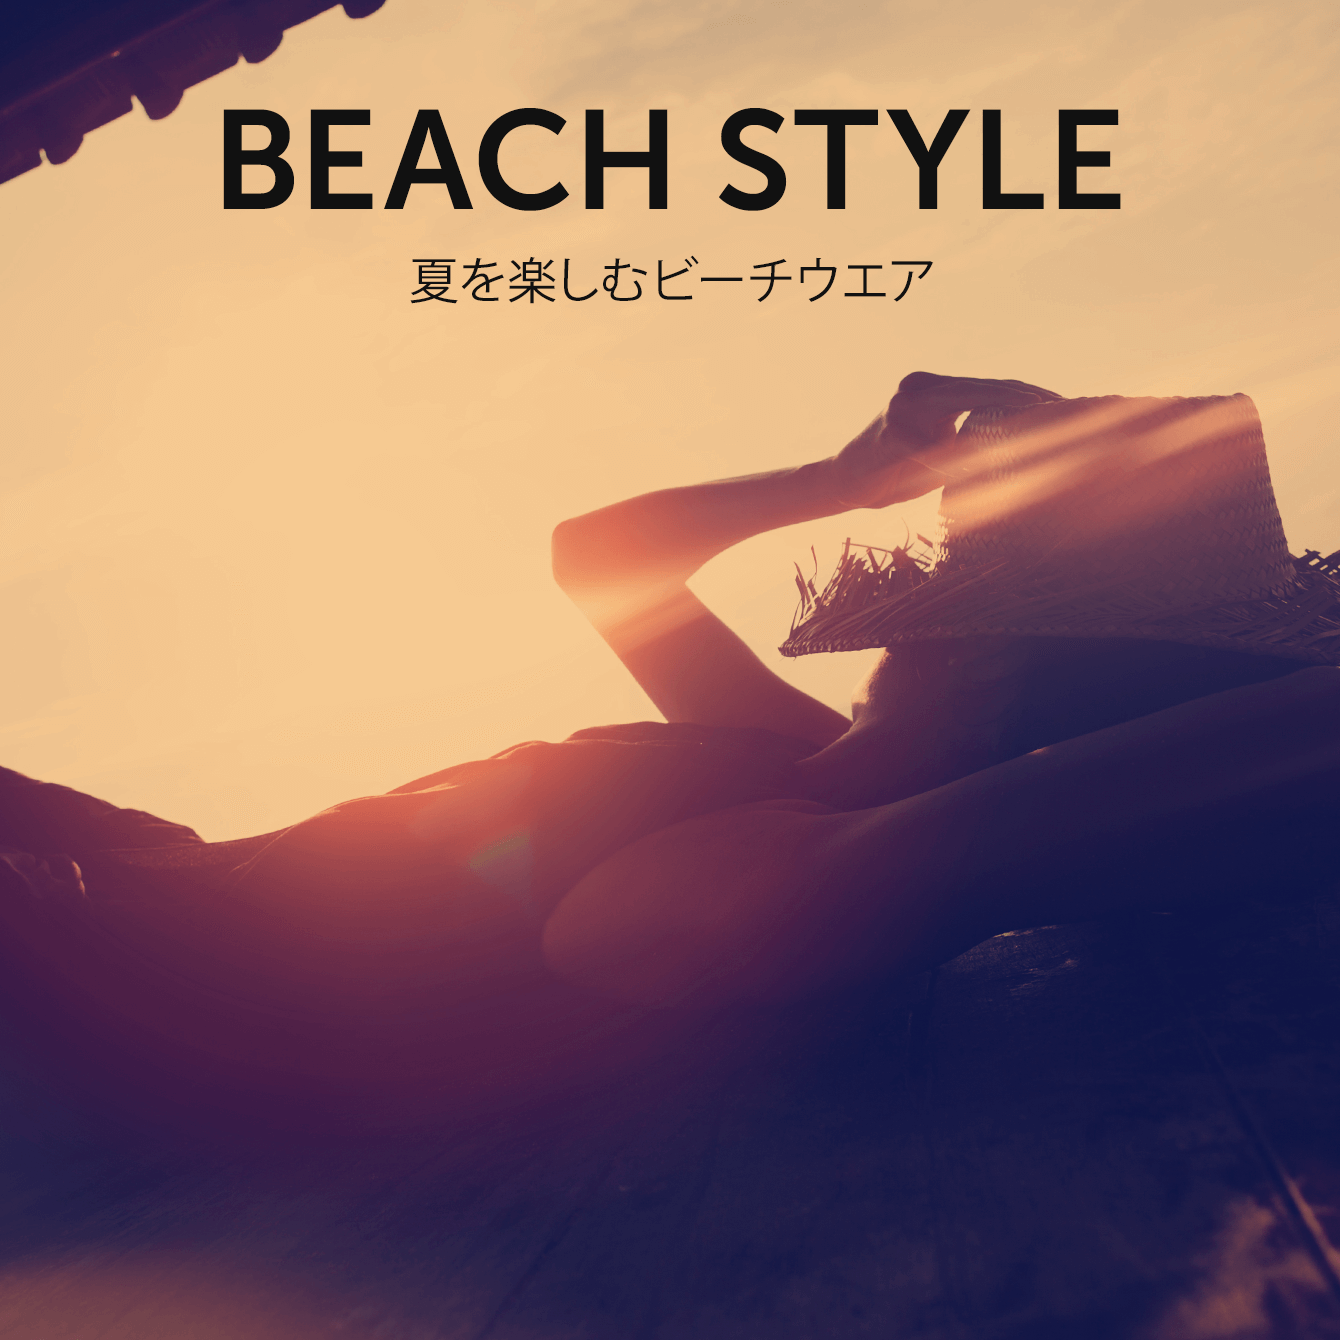 Beach Stye 夏を楽しむビーチウェア